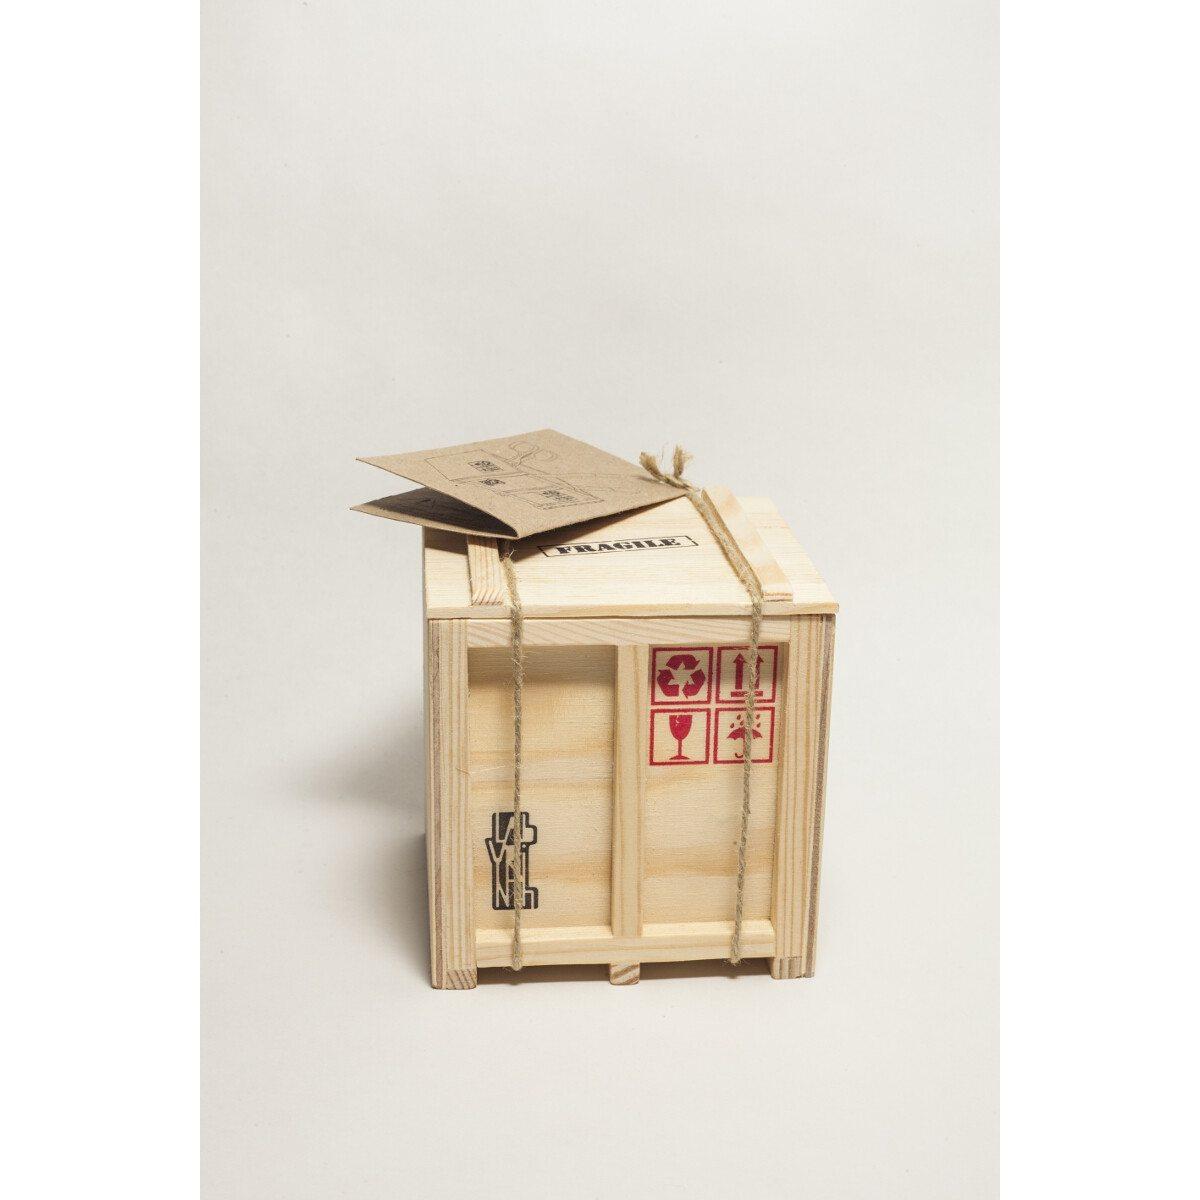 Inbox - Set of 3 designer Shipping boxes